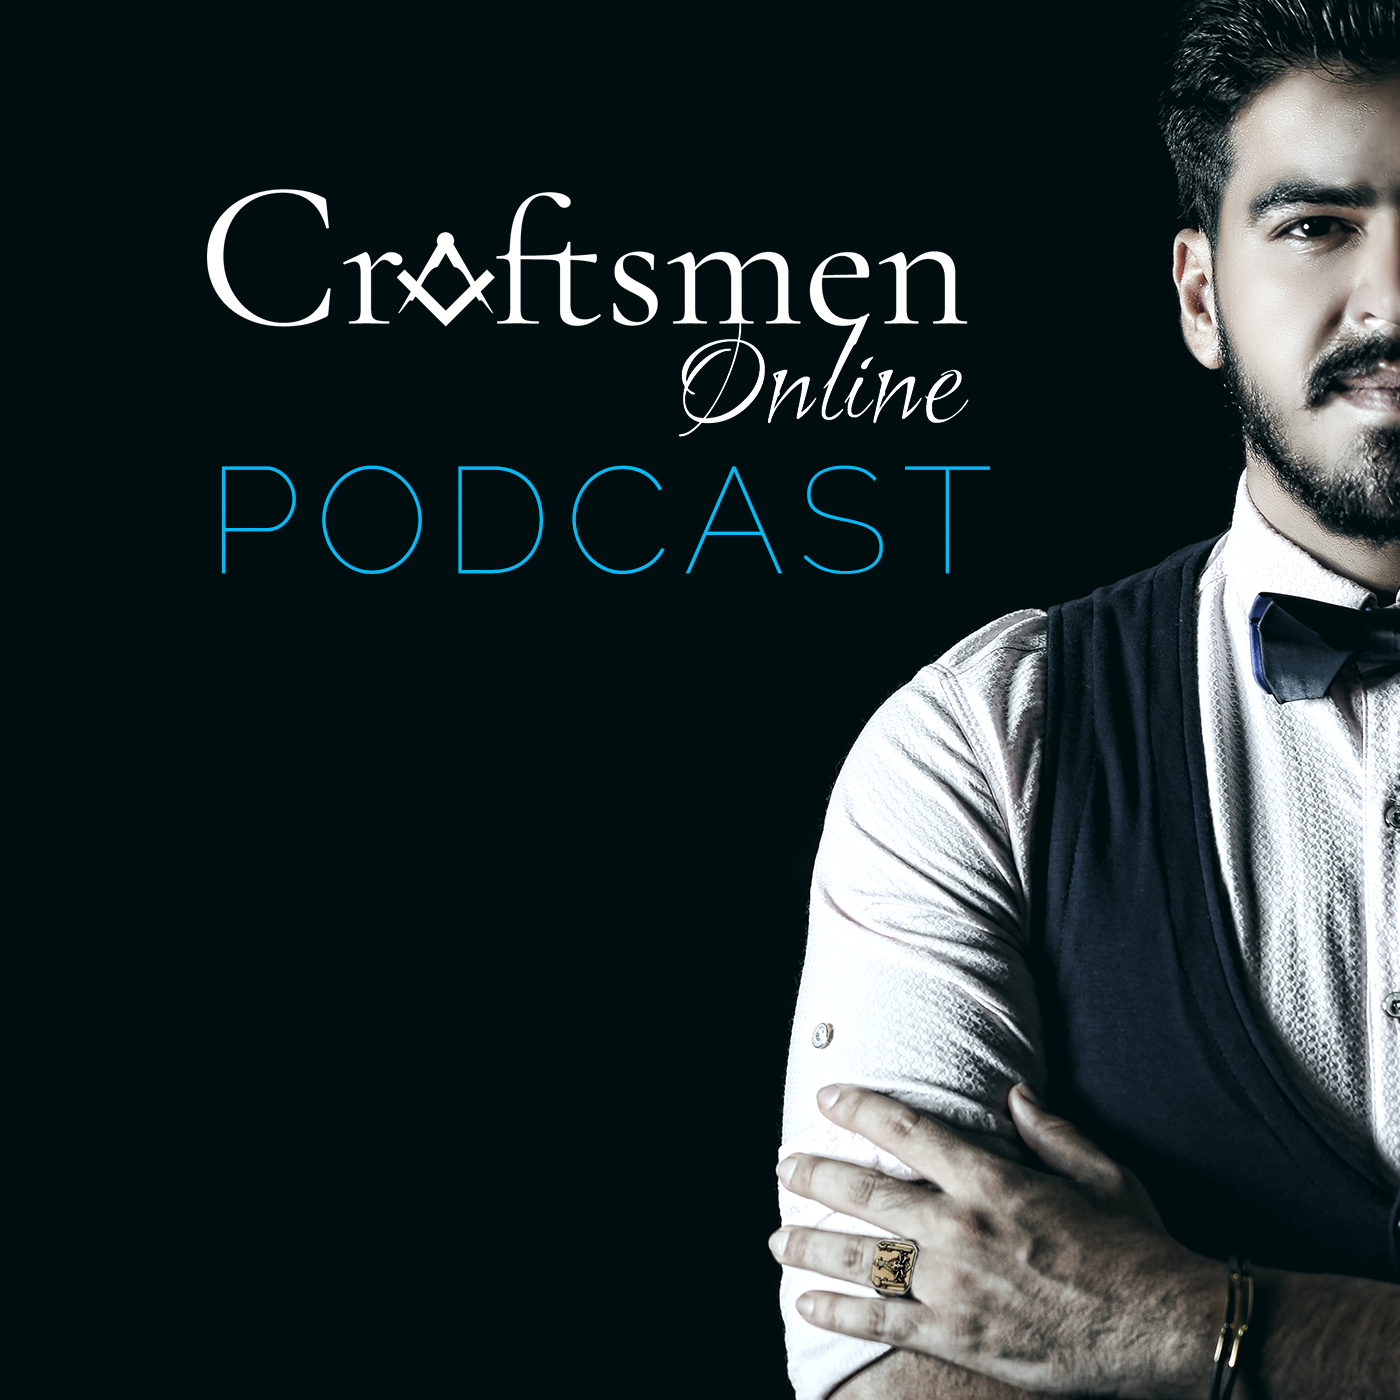 Craftsmen Online Podcast on iTunes